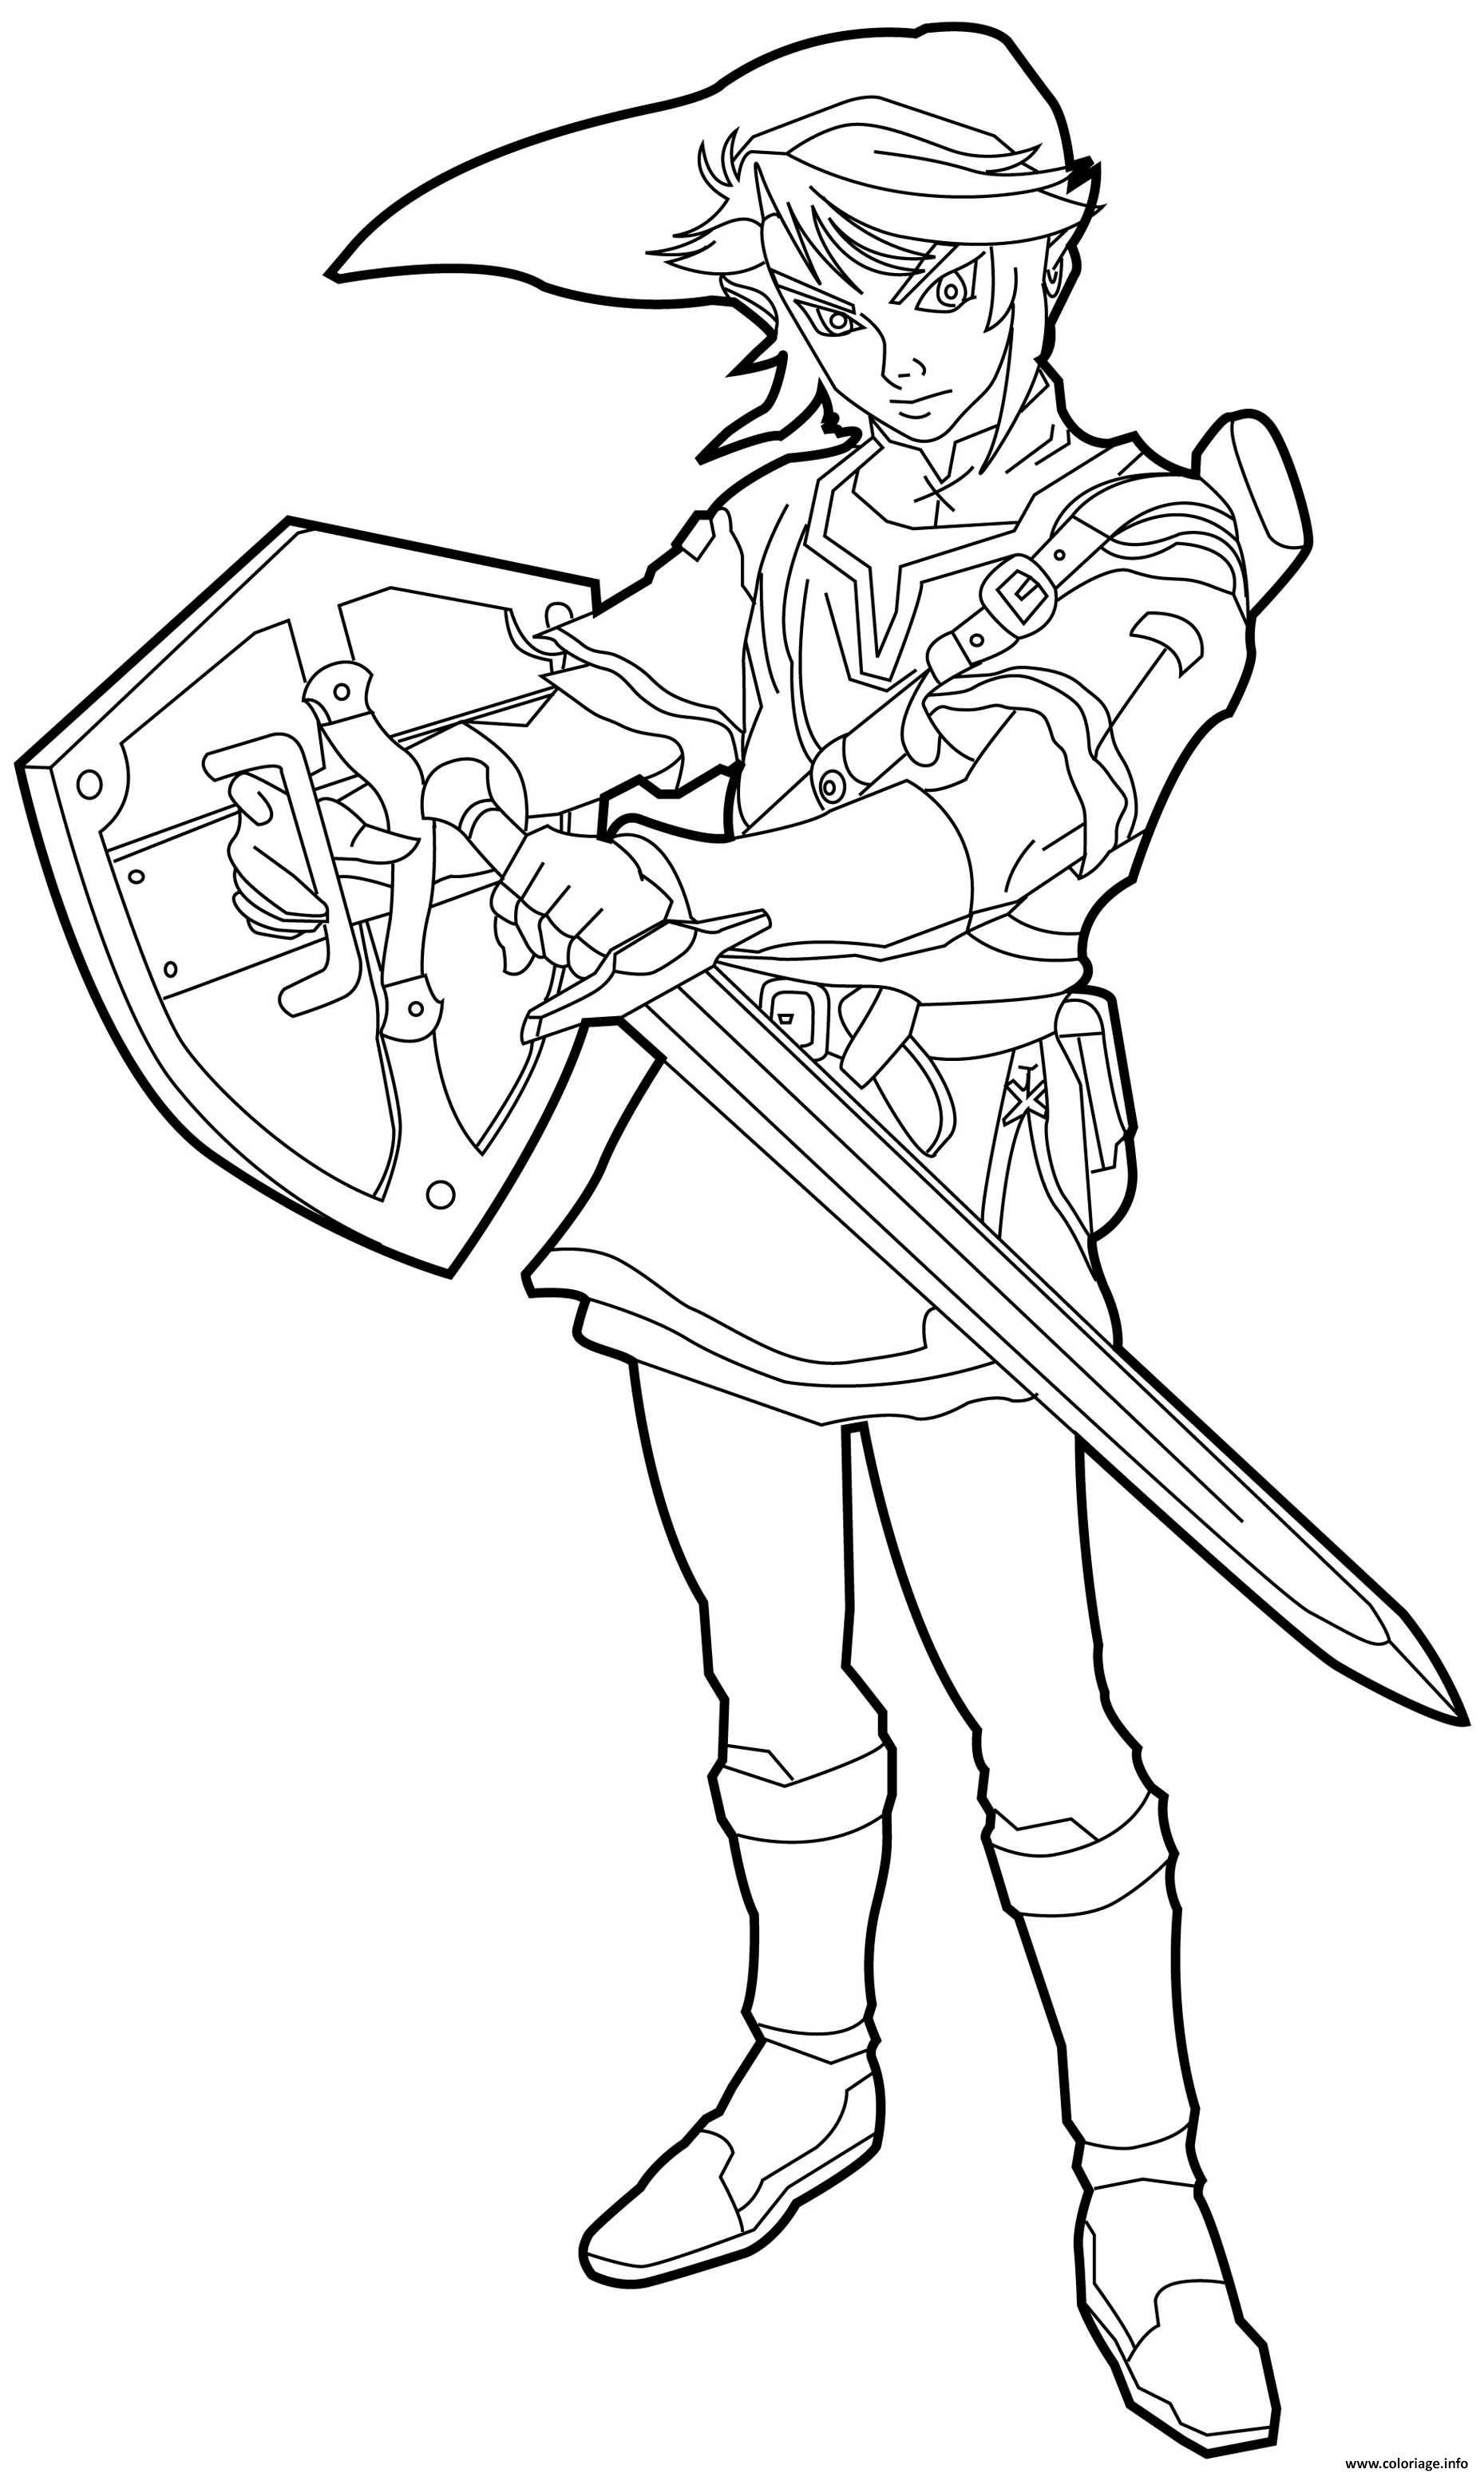 Coloriage The Legend Of Zelda Par Shigeru Miyamoto Et Takashi